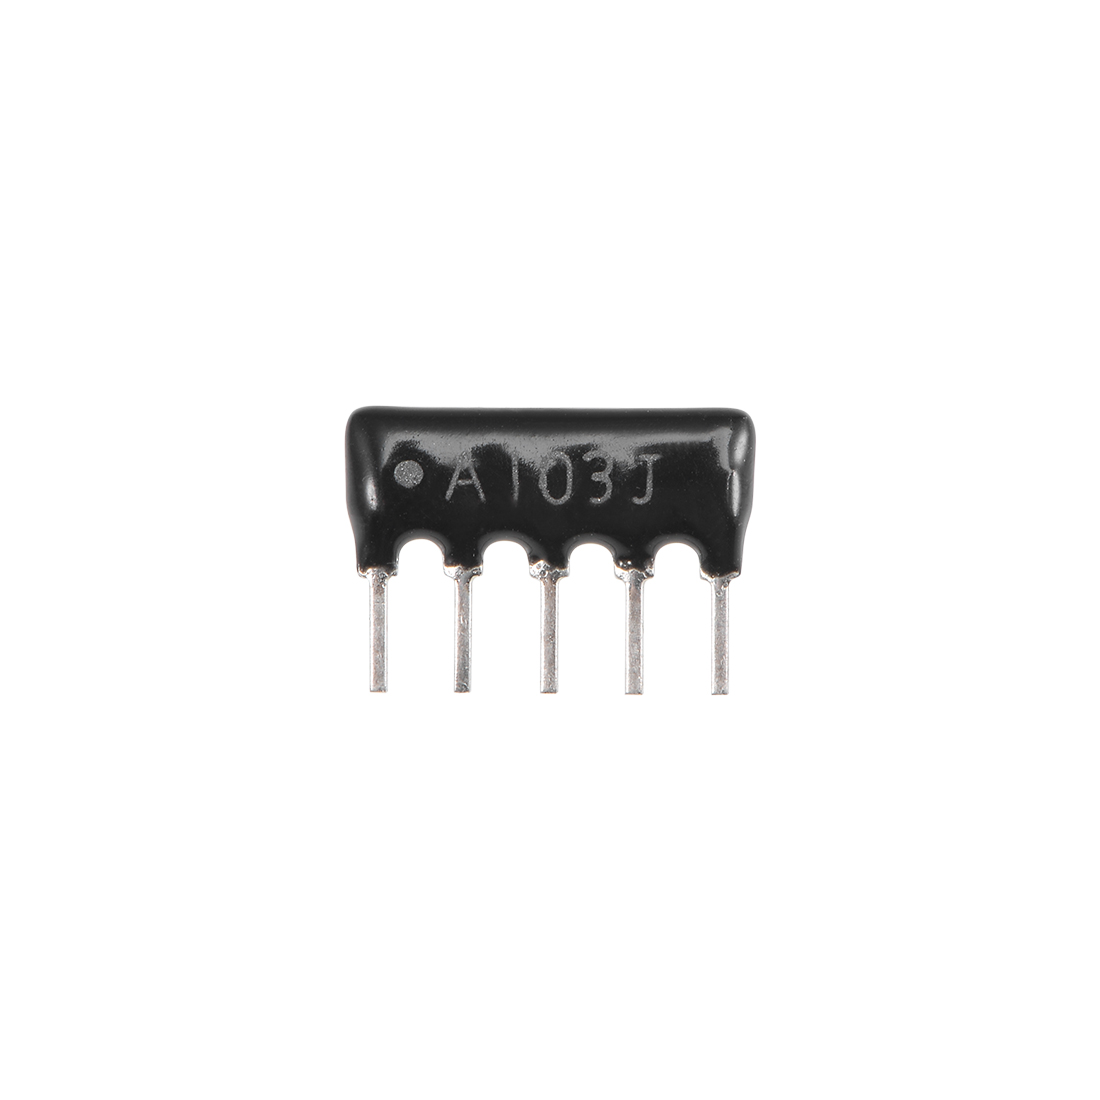 10K Ohm Resistor Network 1/8W SIP-5 Array 2.54mm Bussed Type 5% Tolerance 10pcs